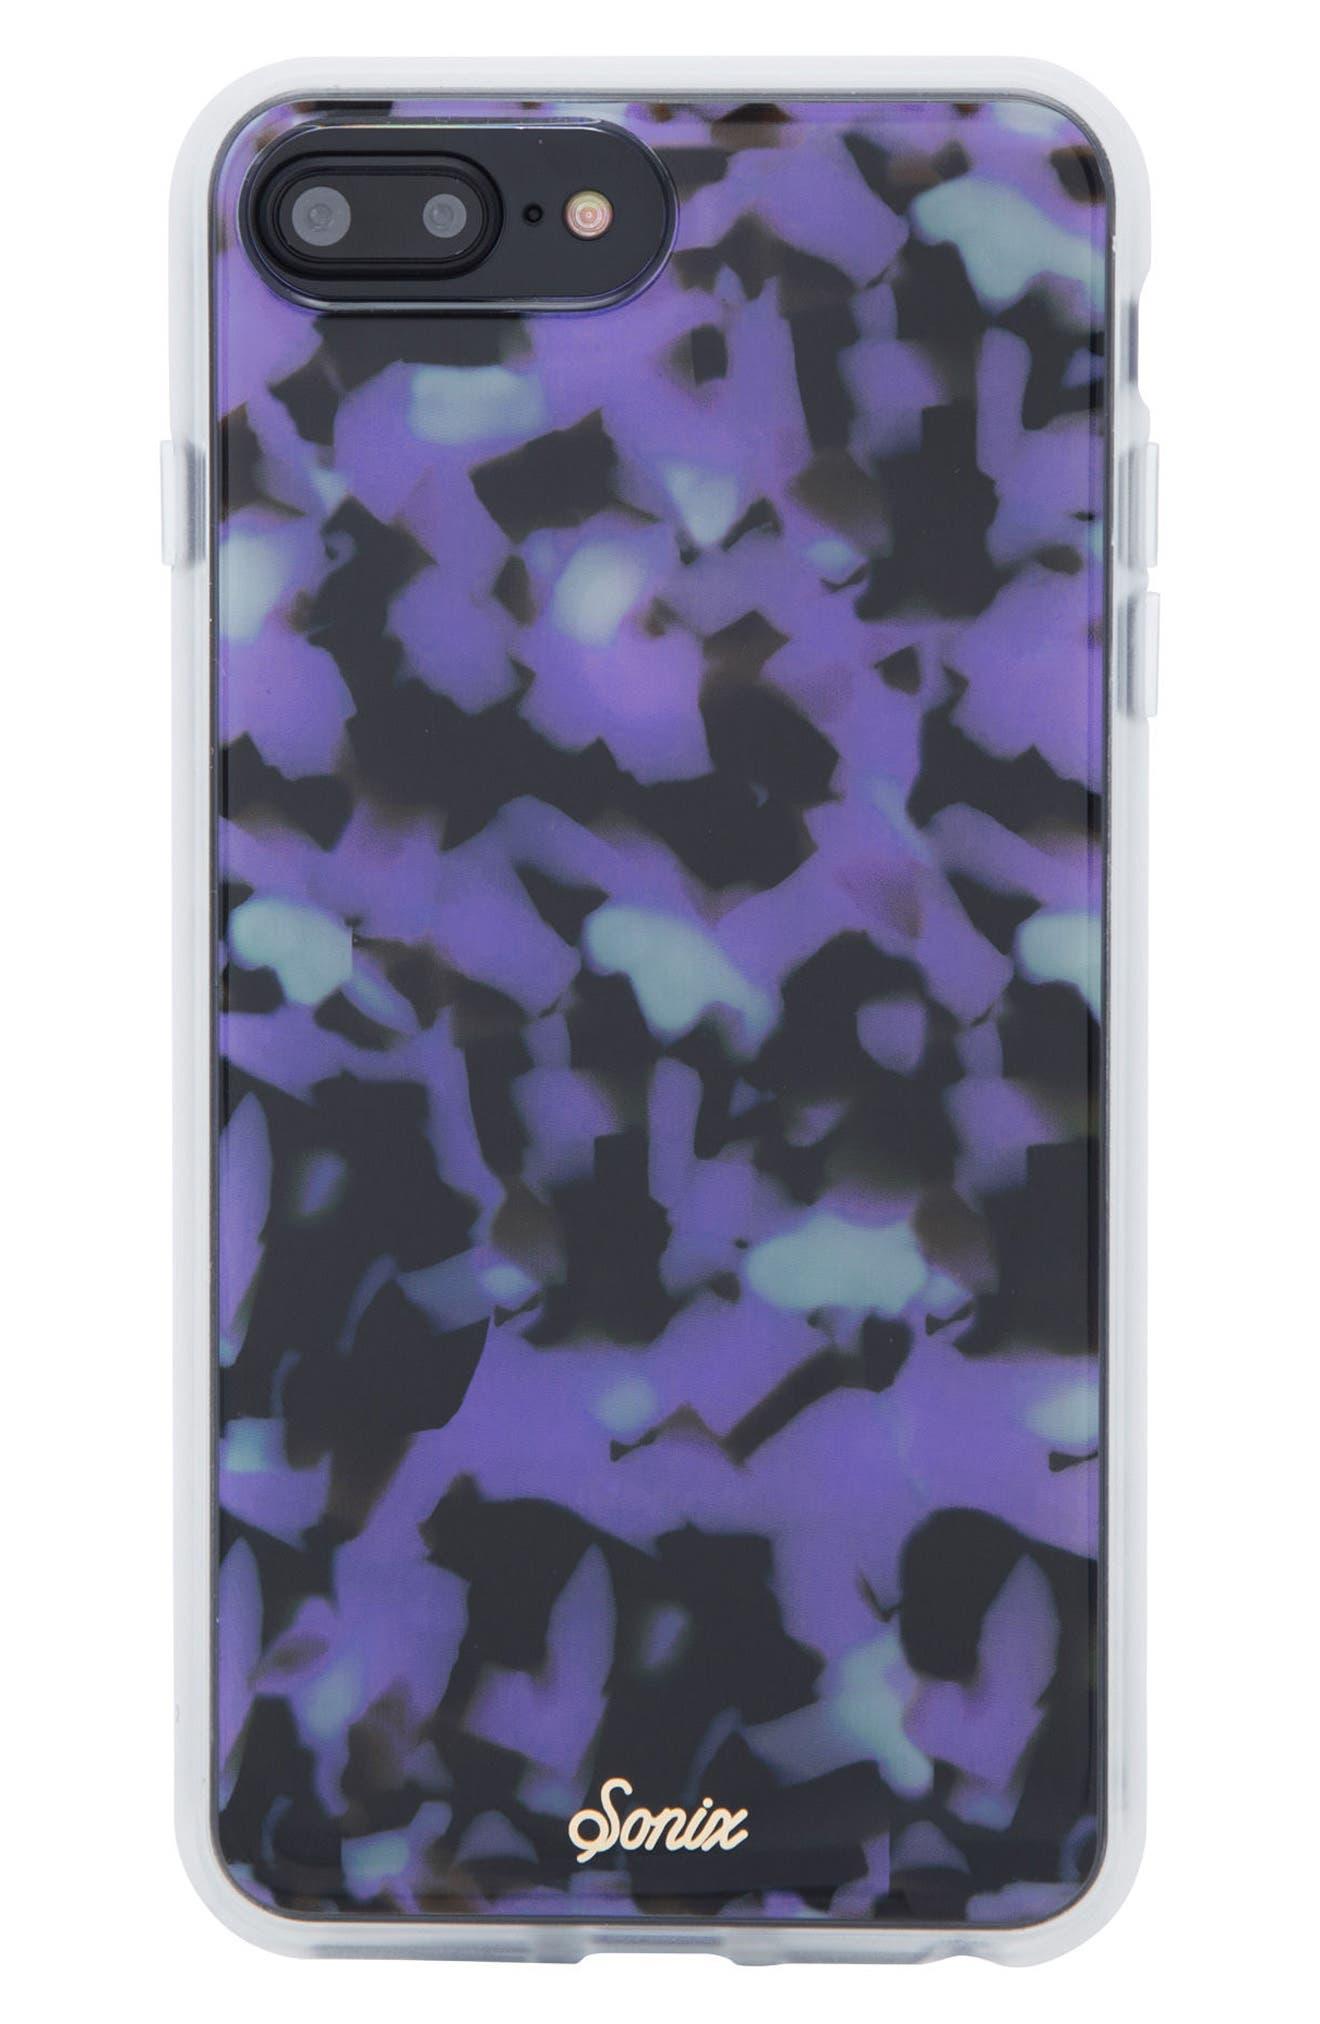 Sonic Terrazzo Lilac iPhone 6/6s/7/8 & 6/6s/7/8 Plus Case